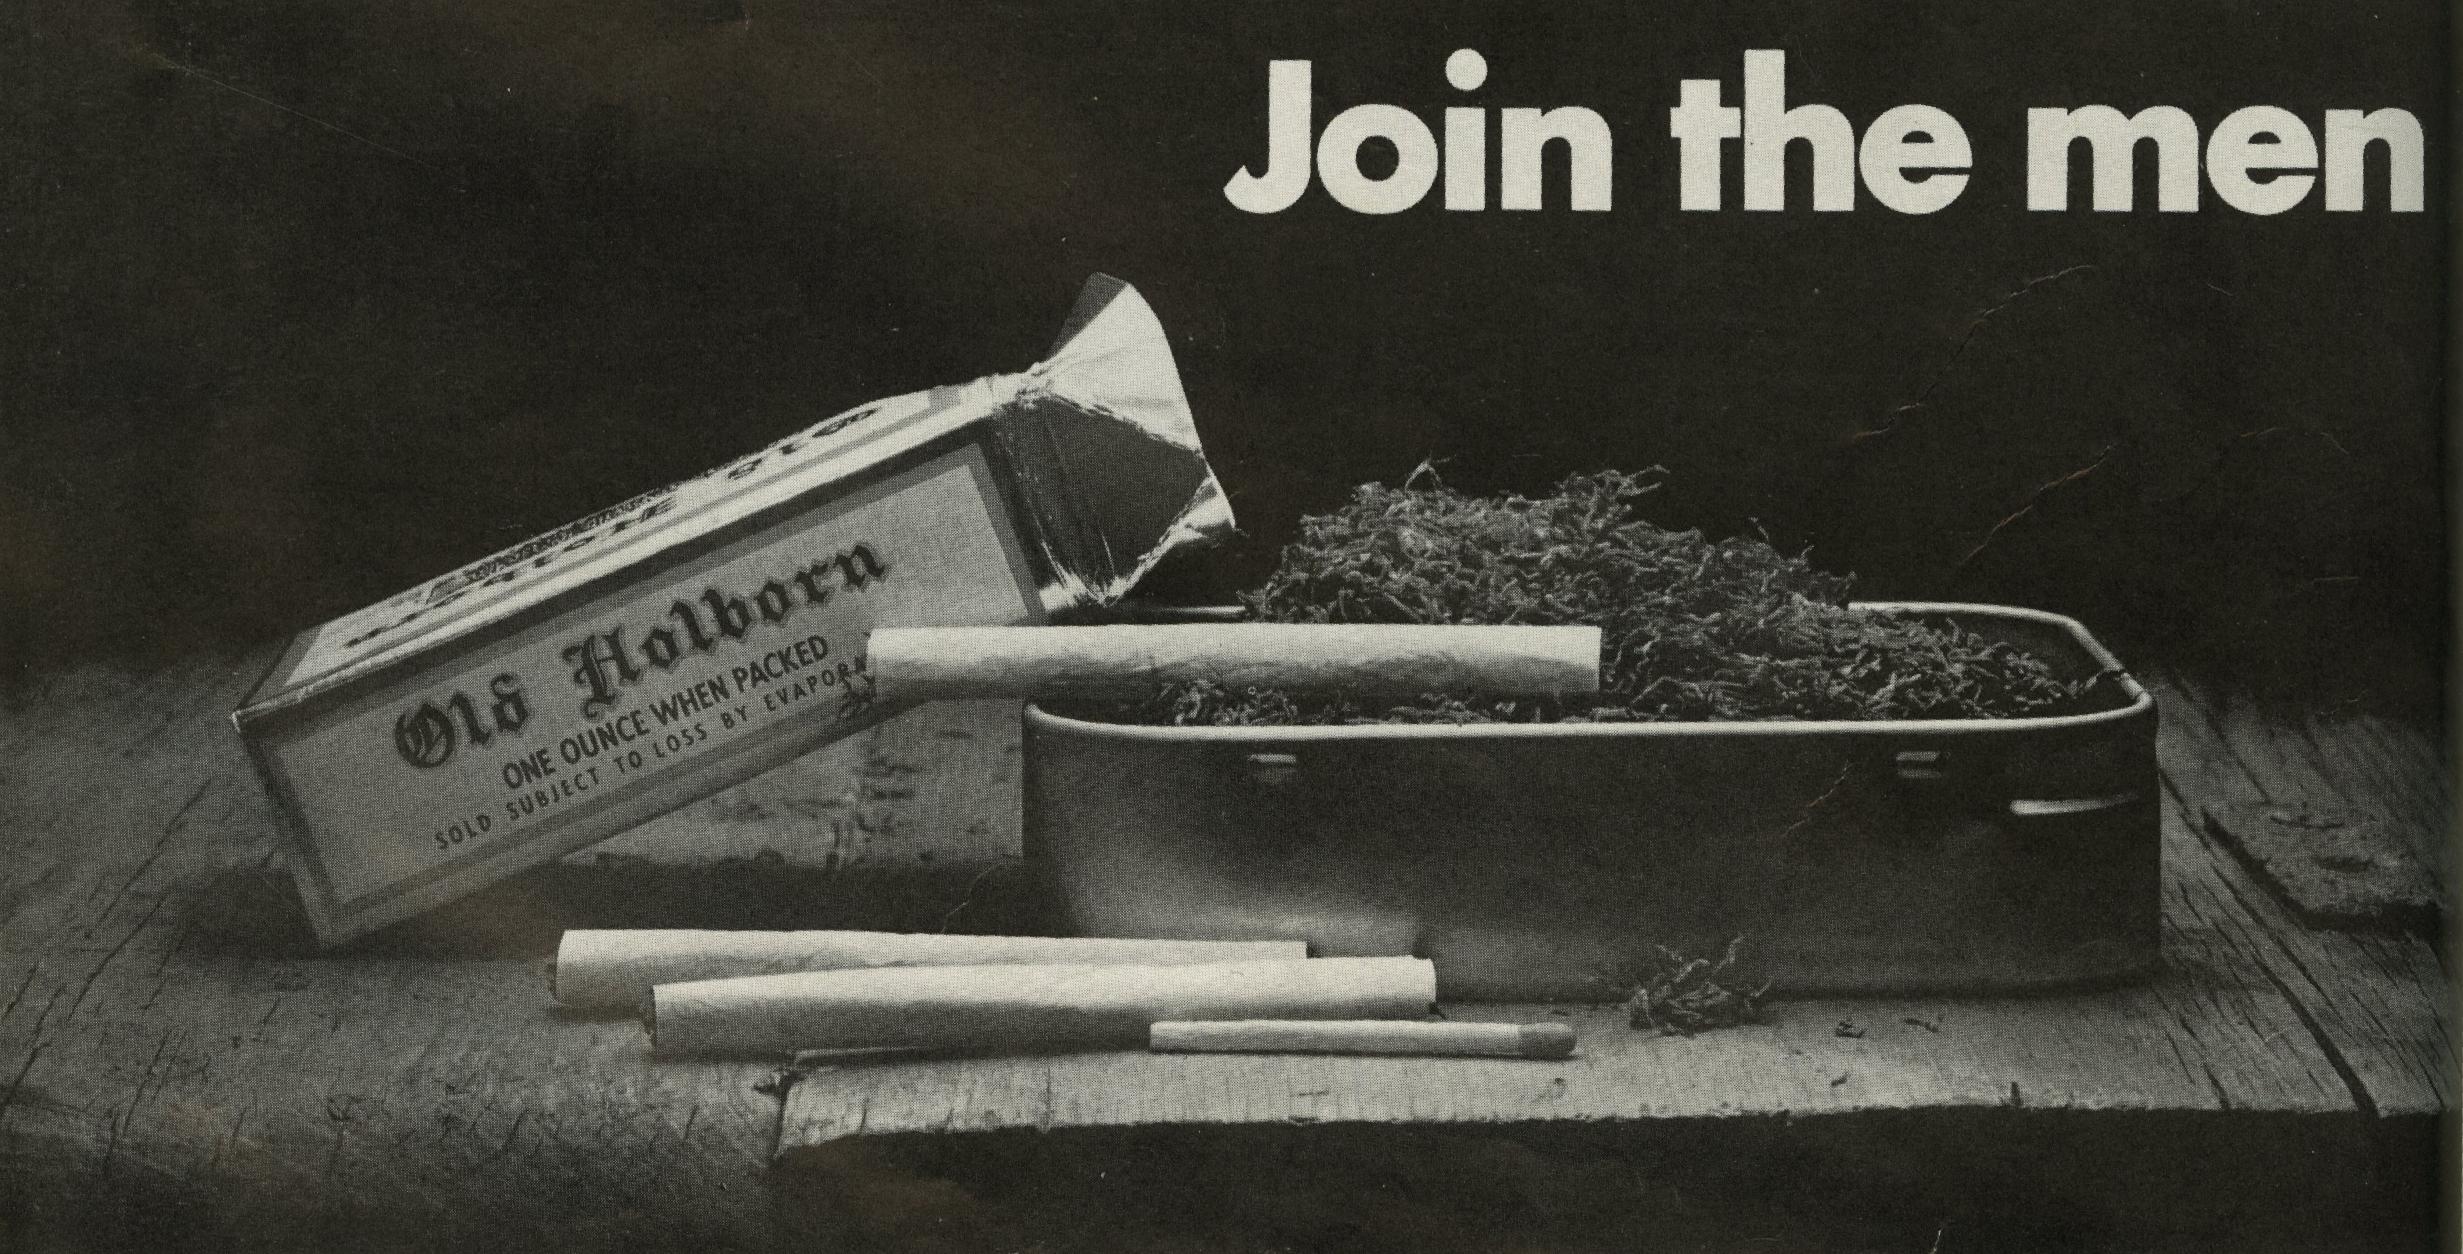 Old Holborn 'Men', David Holmes, KMP-01